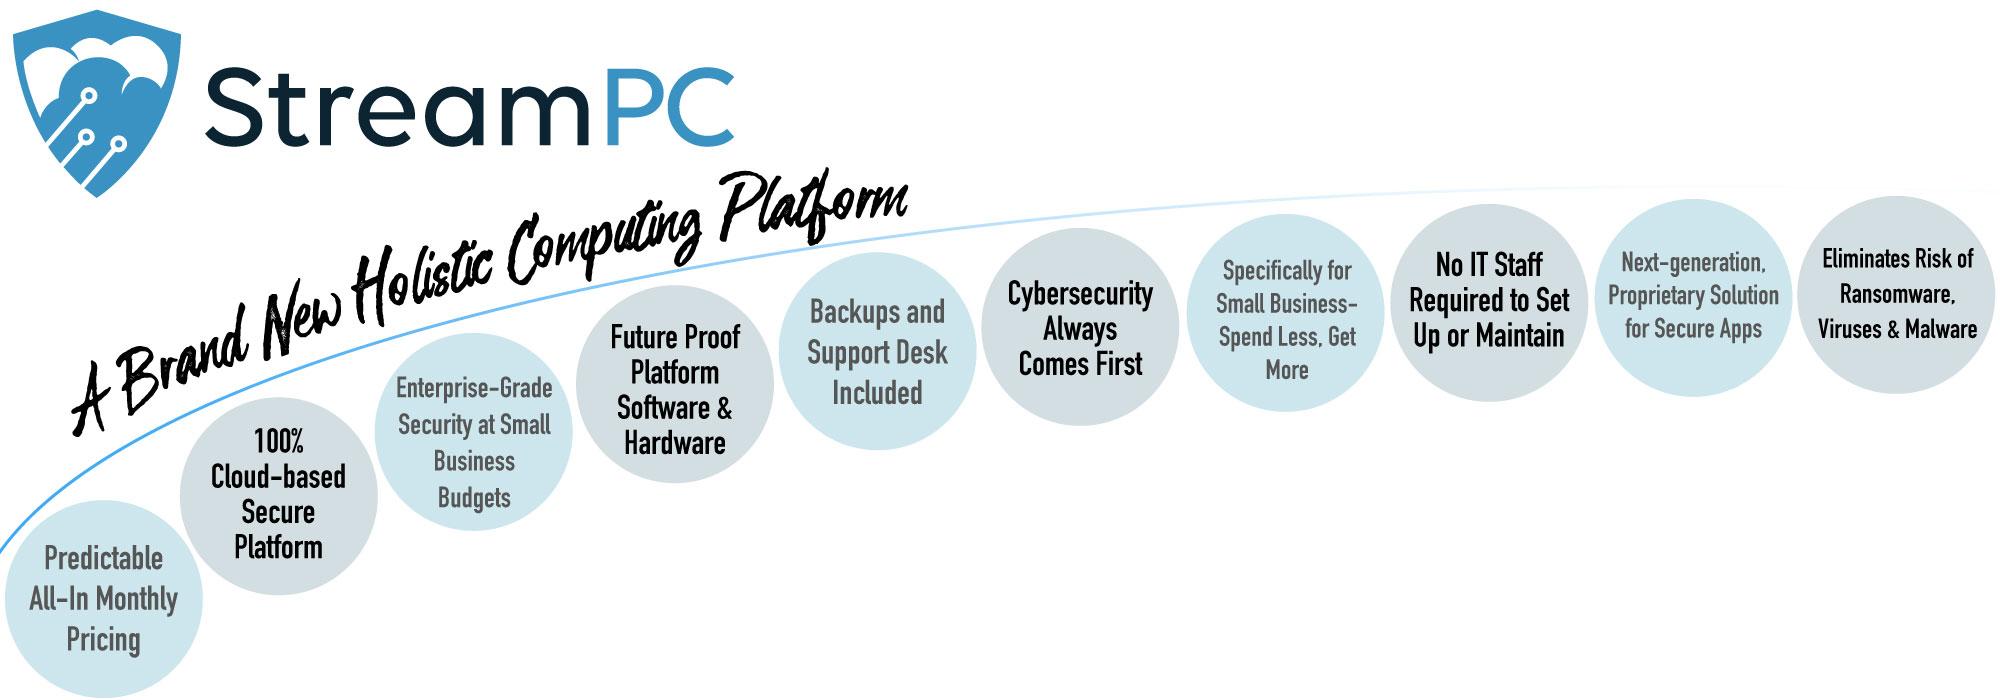 holistic computing platform